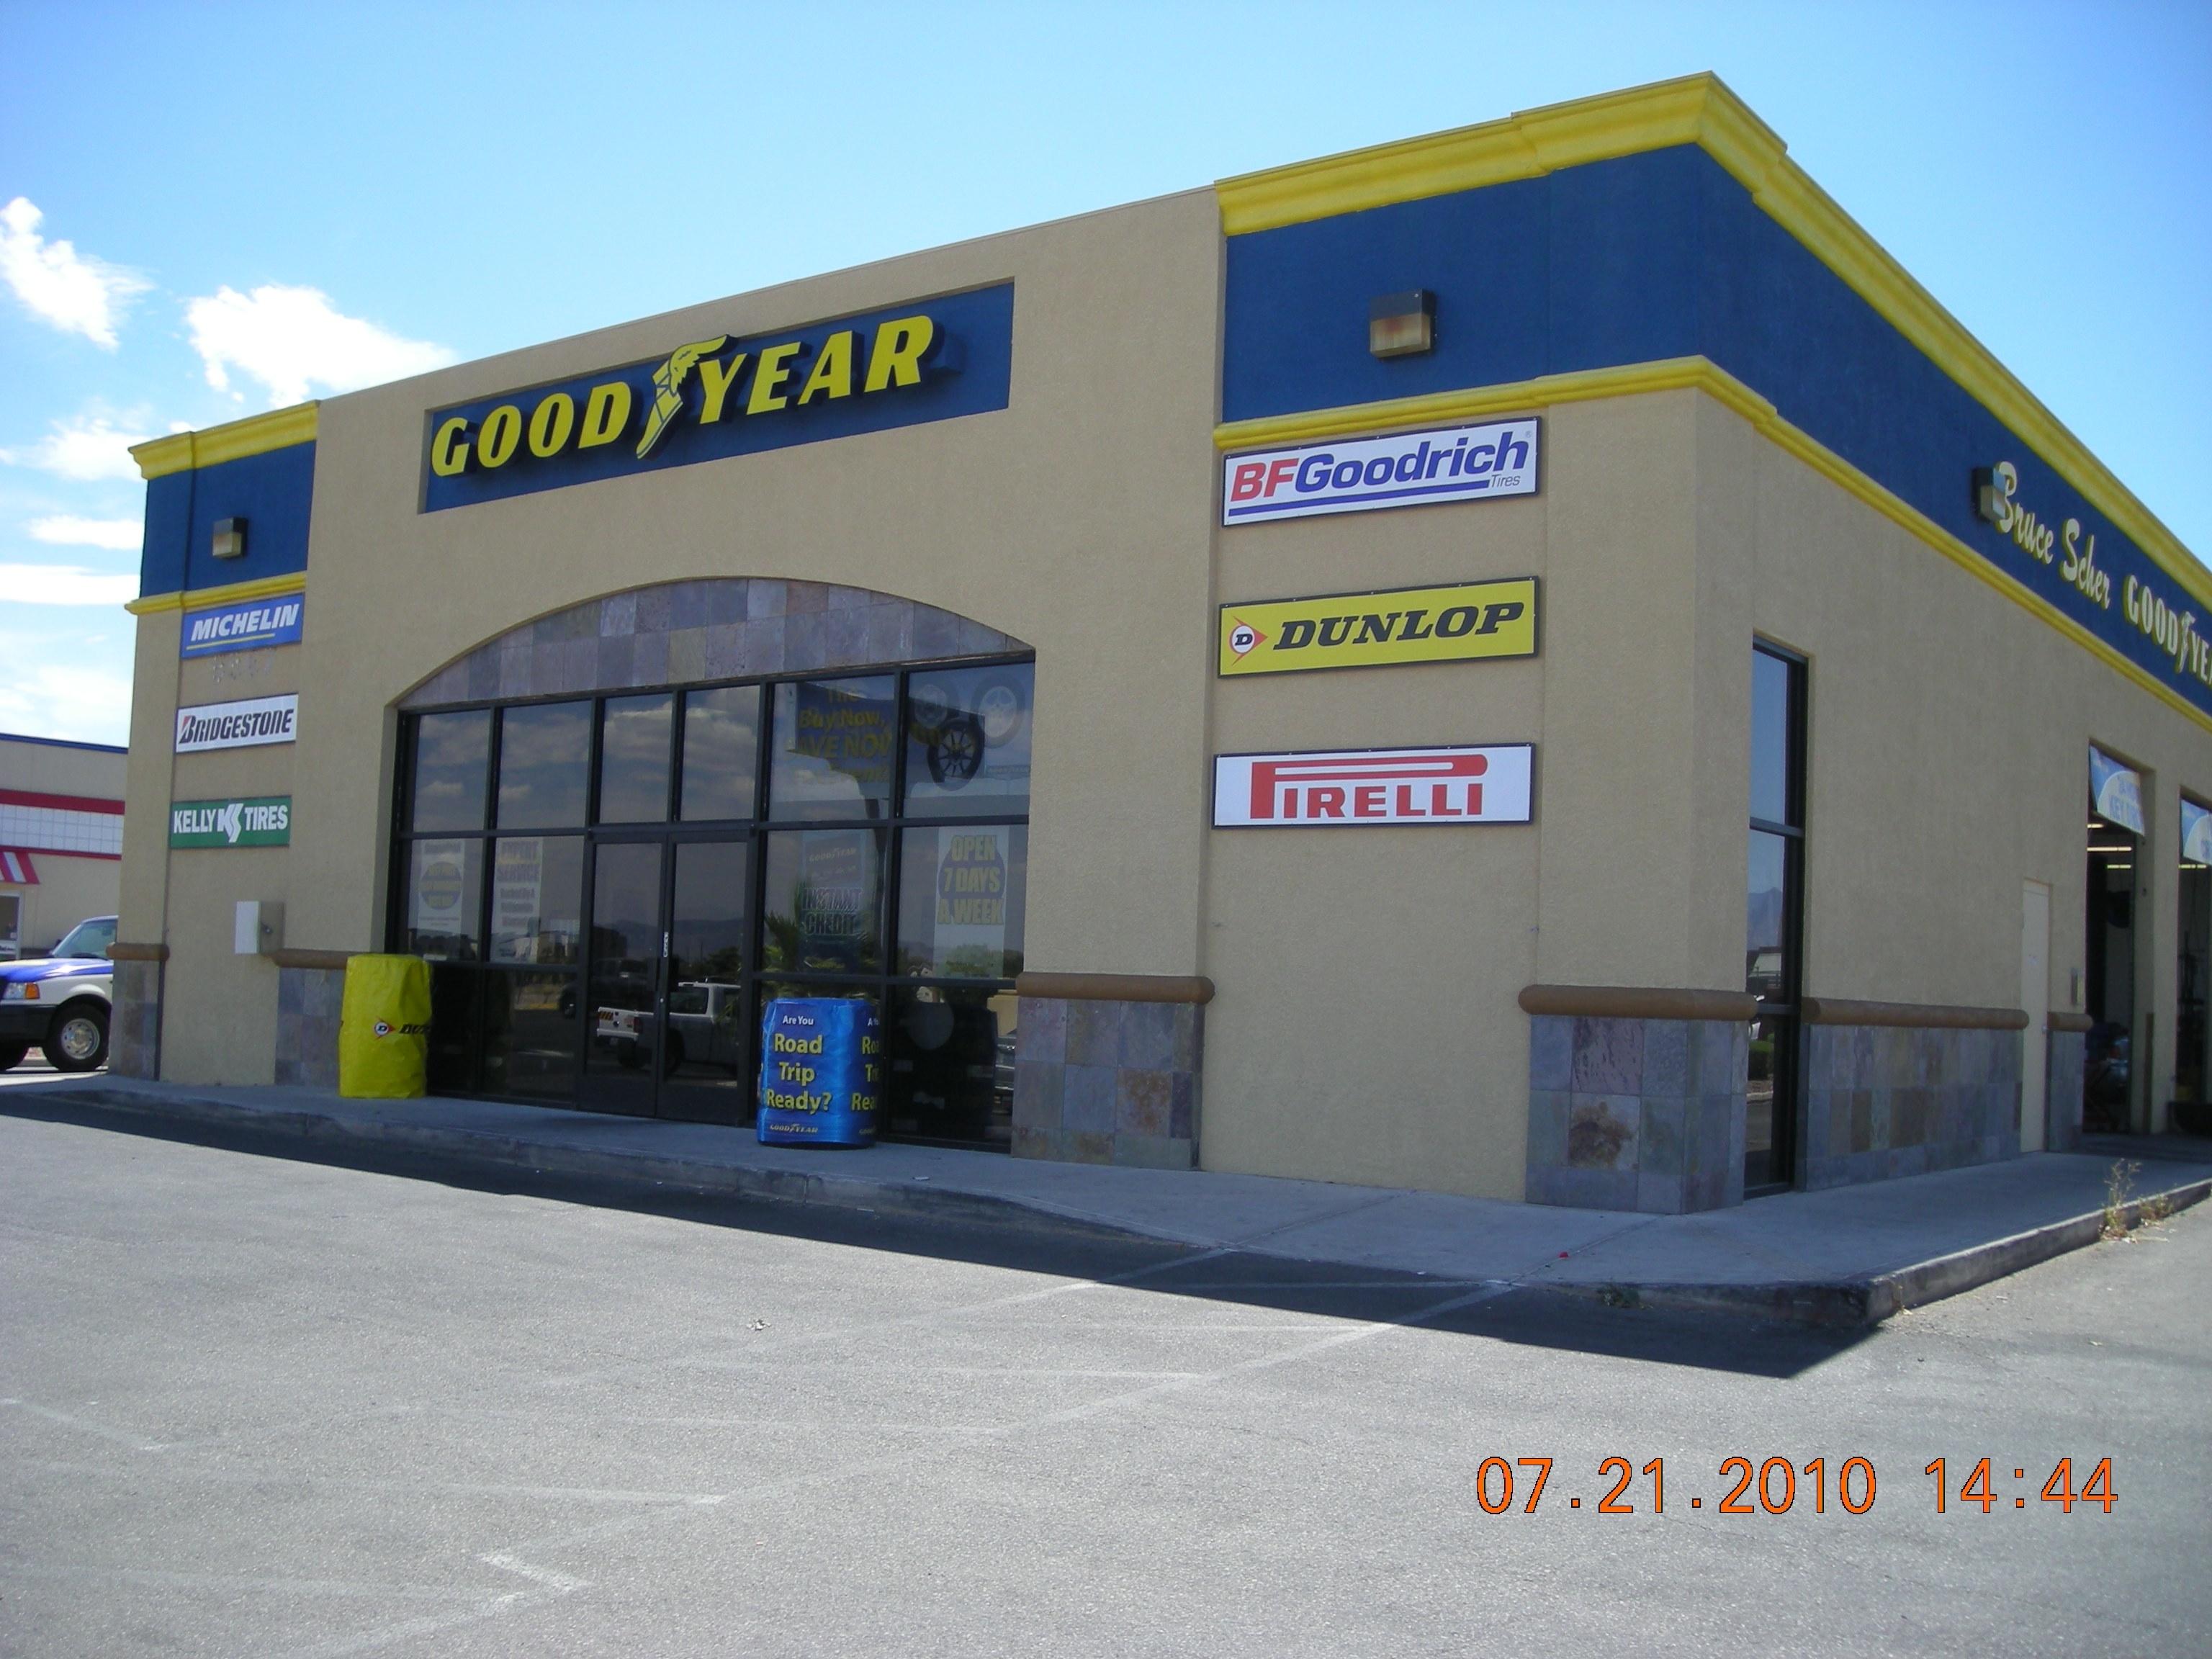 superior tire goodyear auto service center las vegas nevada nv. Black Bedroom Furniture Sets. Home Design Ideas